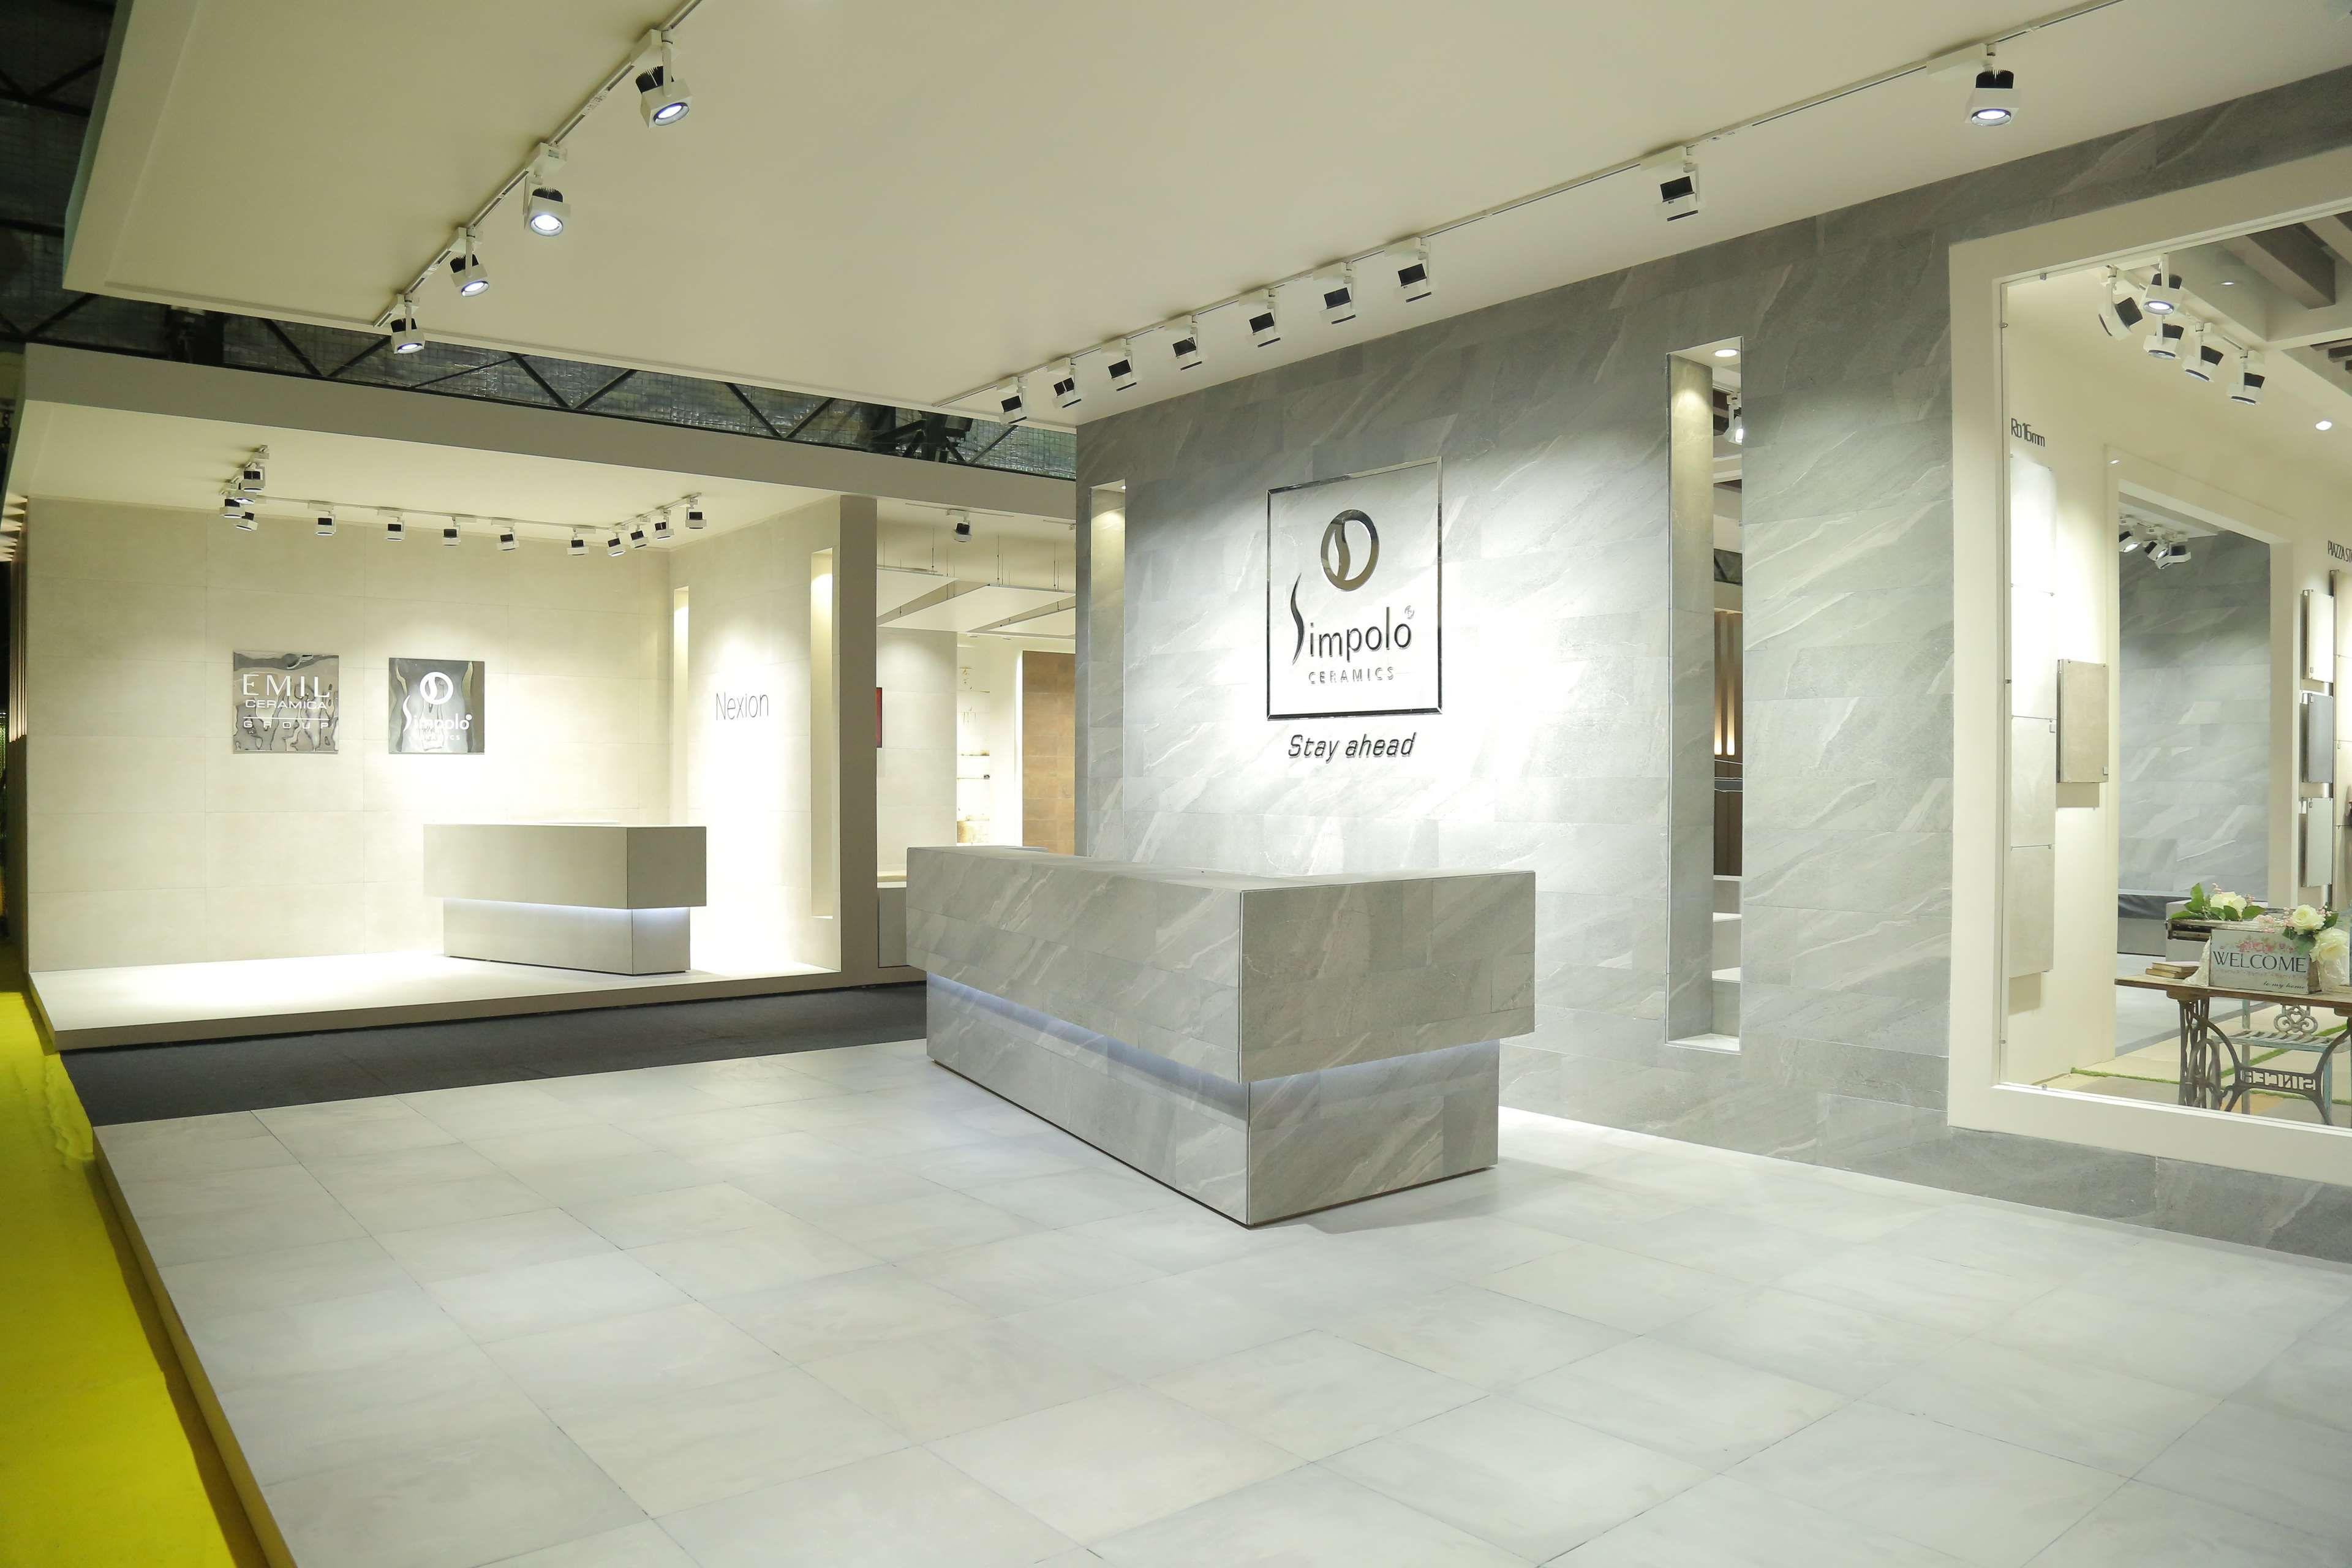 Daltile Houston Full Size Of Tiles Showroom Bathroom Tile Salt Lake - Discount tile stores atlanta